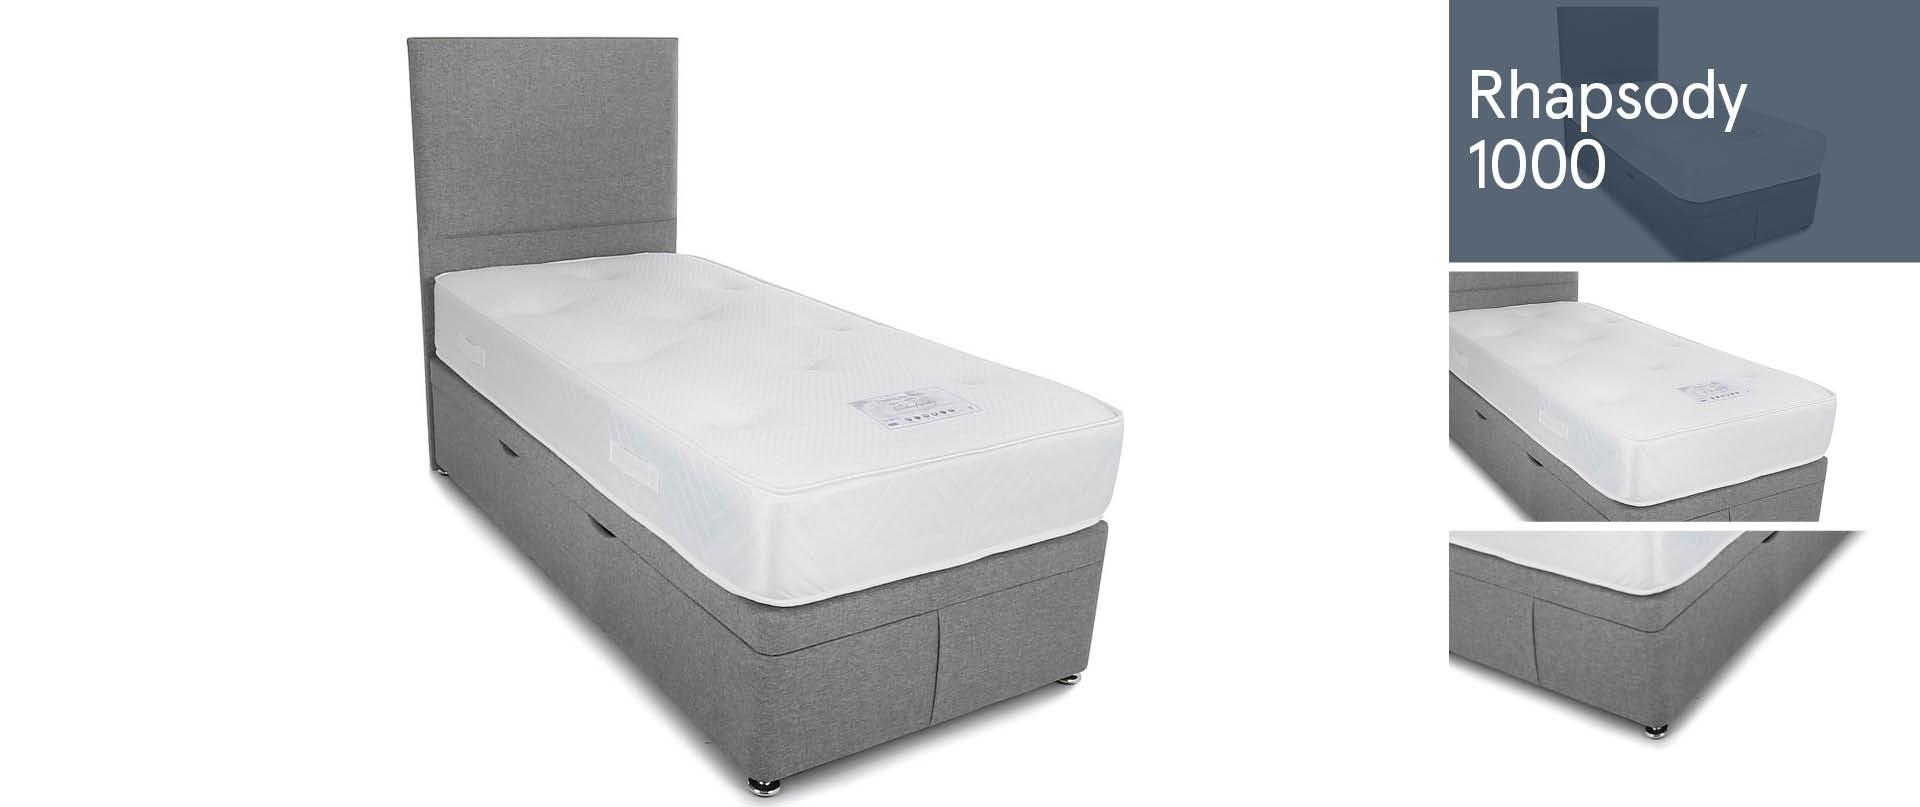 Rhapsody-1000 Ottoman Beds Ranges